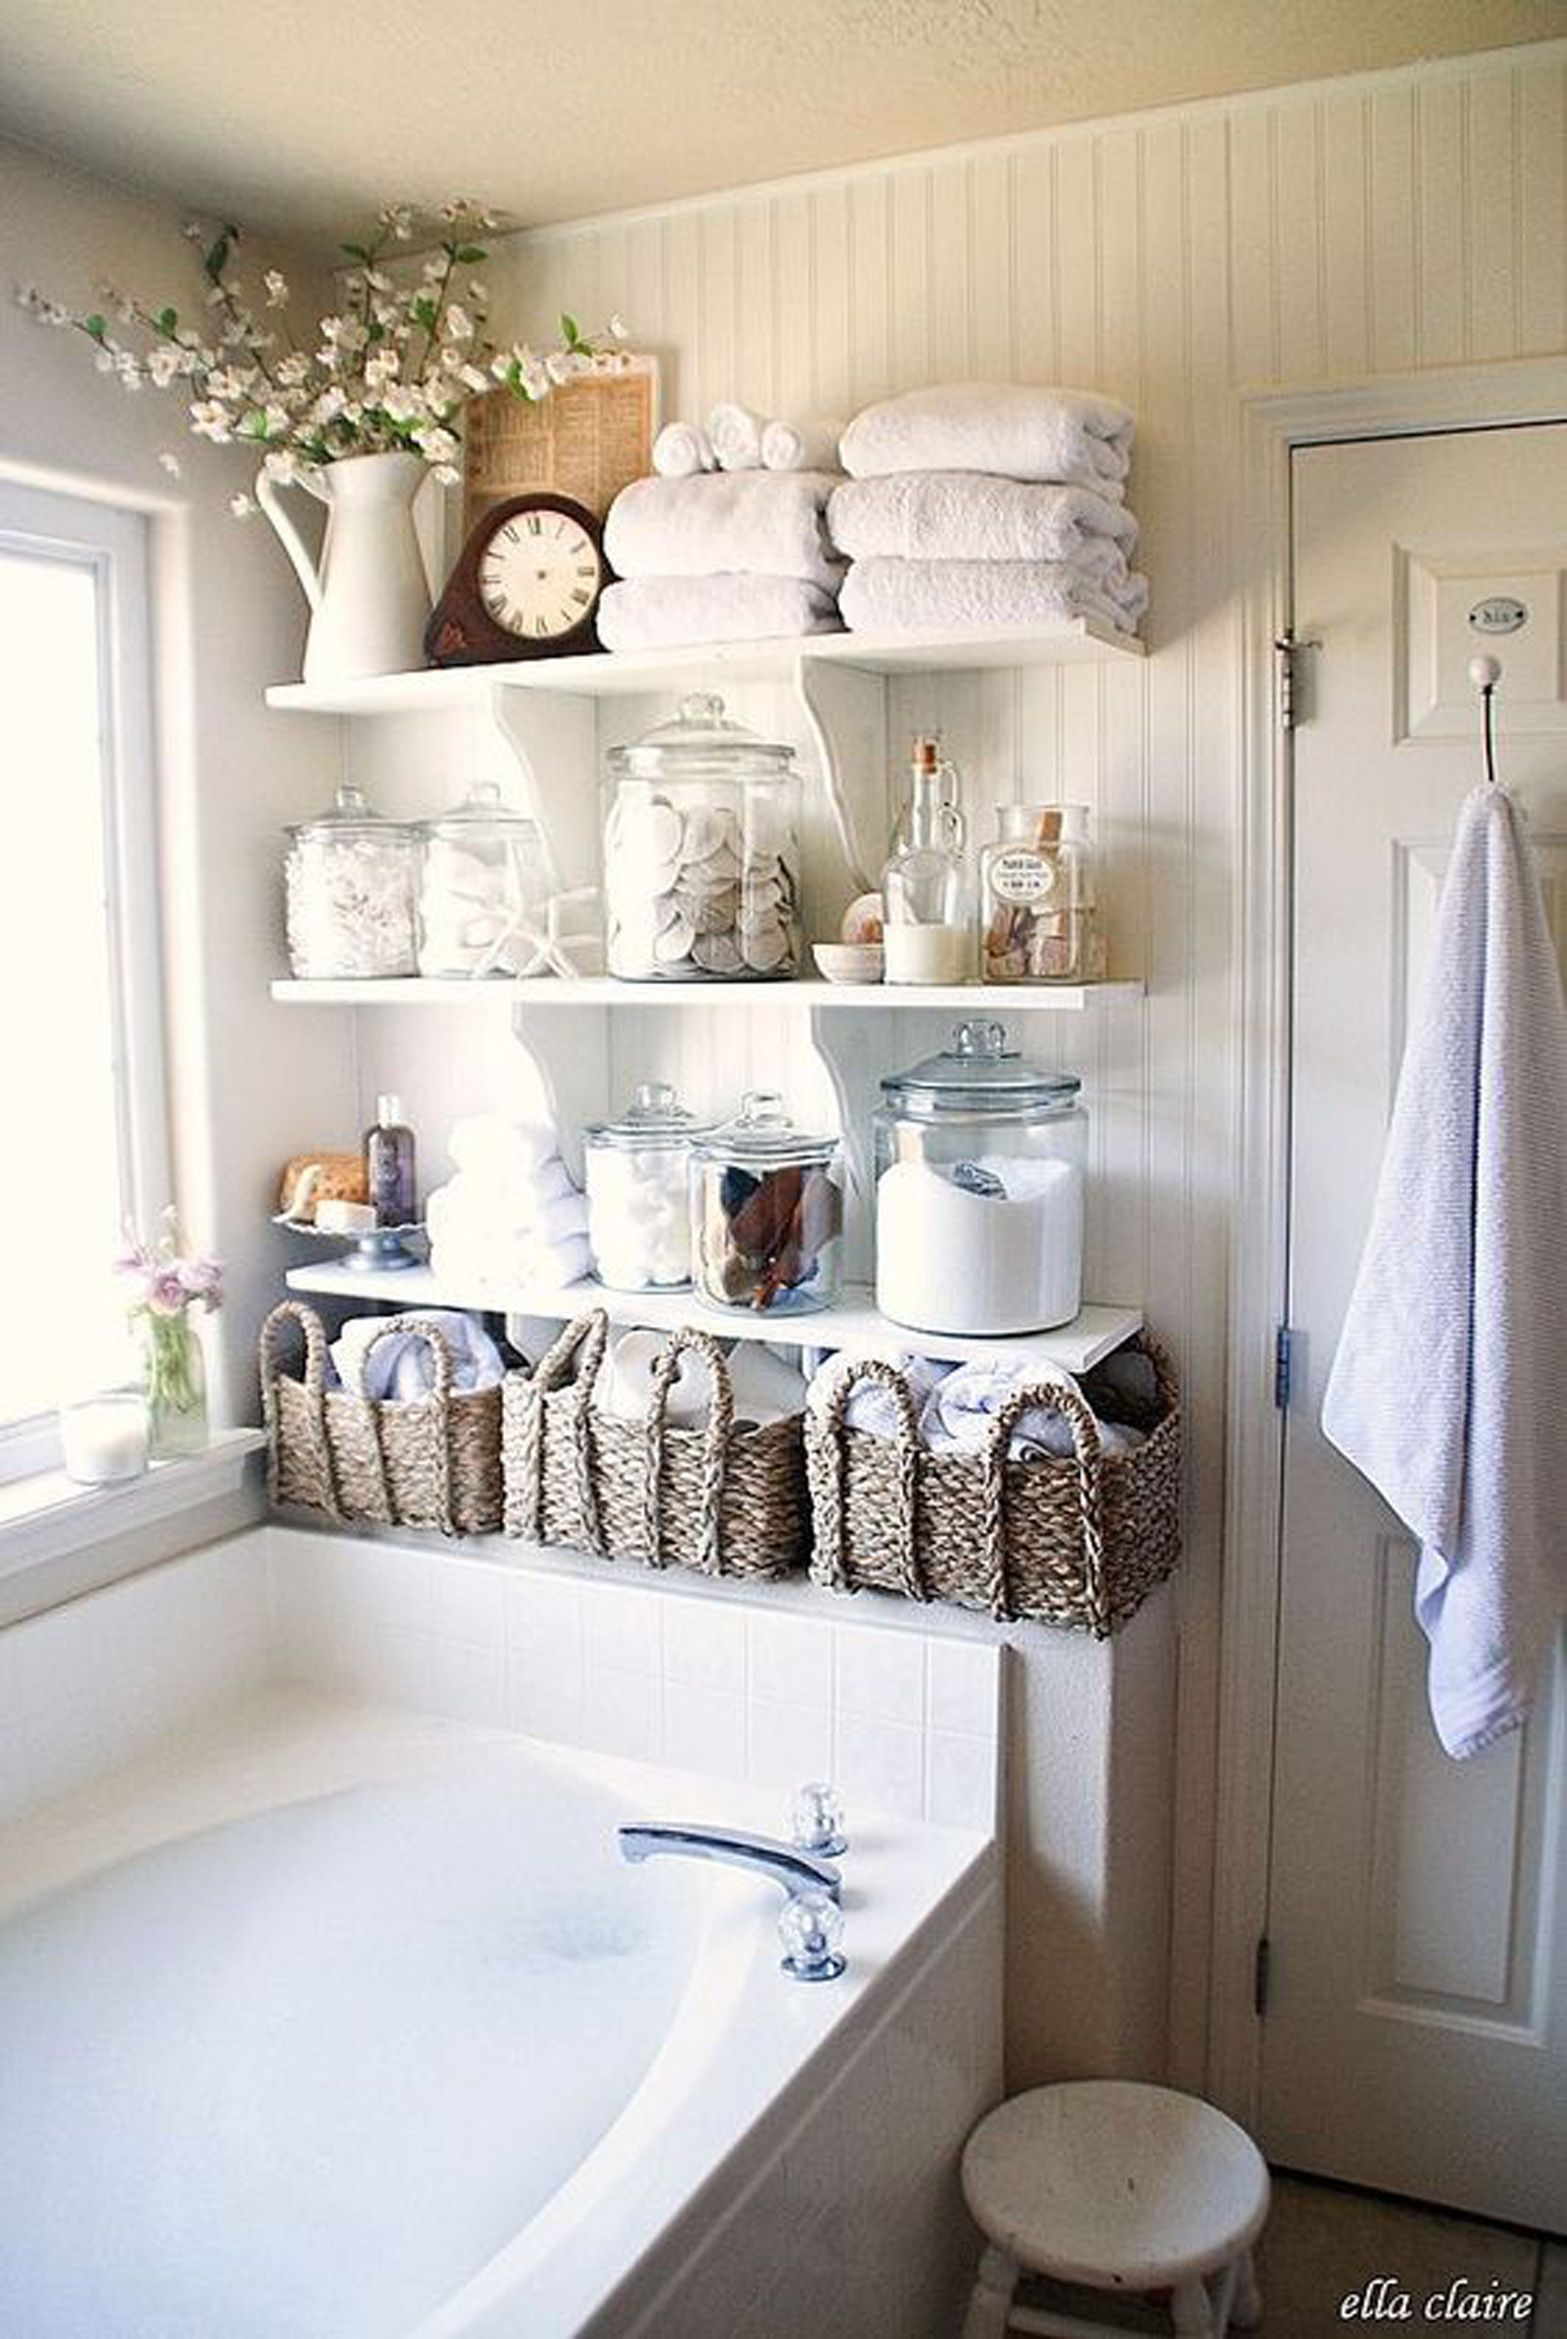 Vasca da bagno shabby chic | Pretty Loo\'s | Pinterest | Shabby, Bath ...